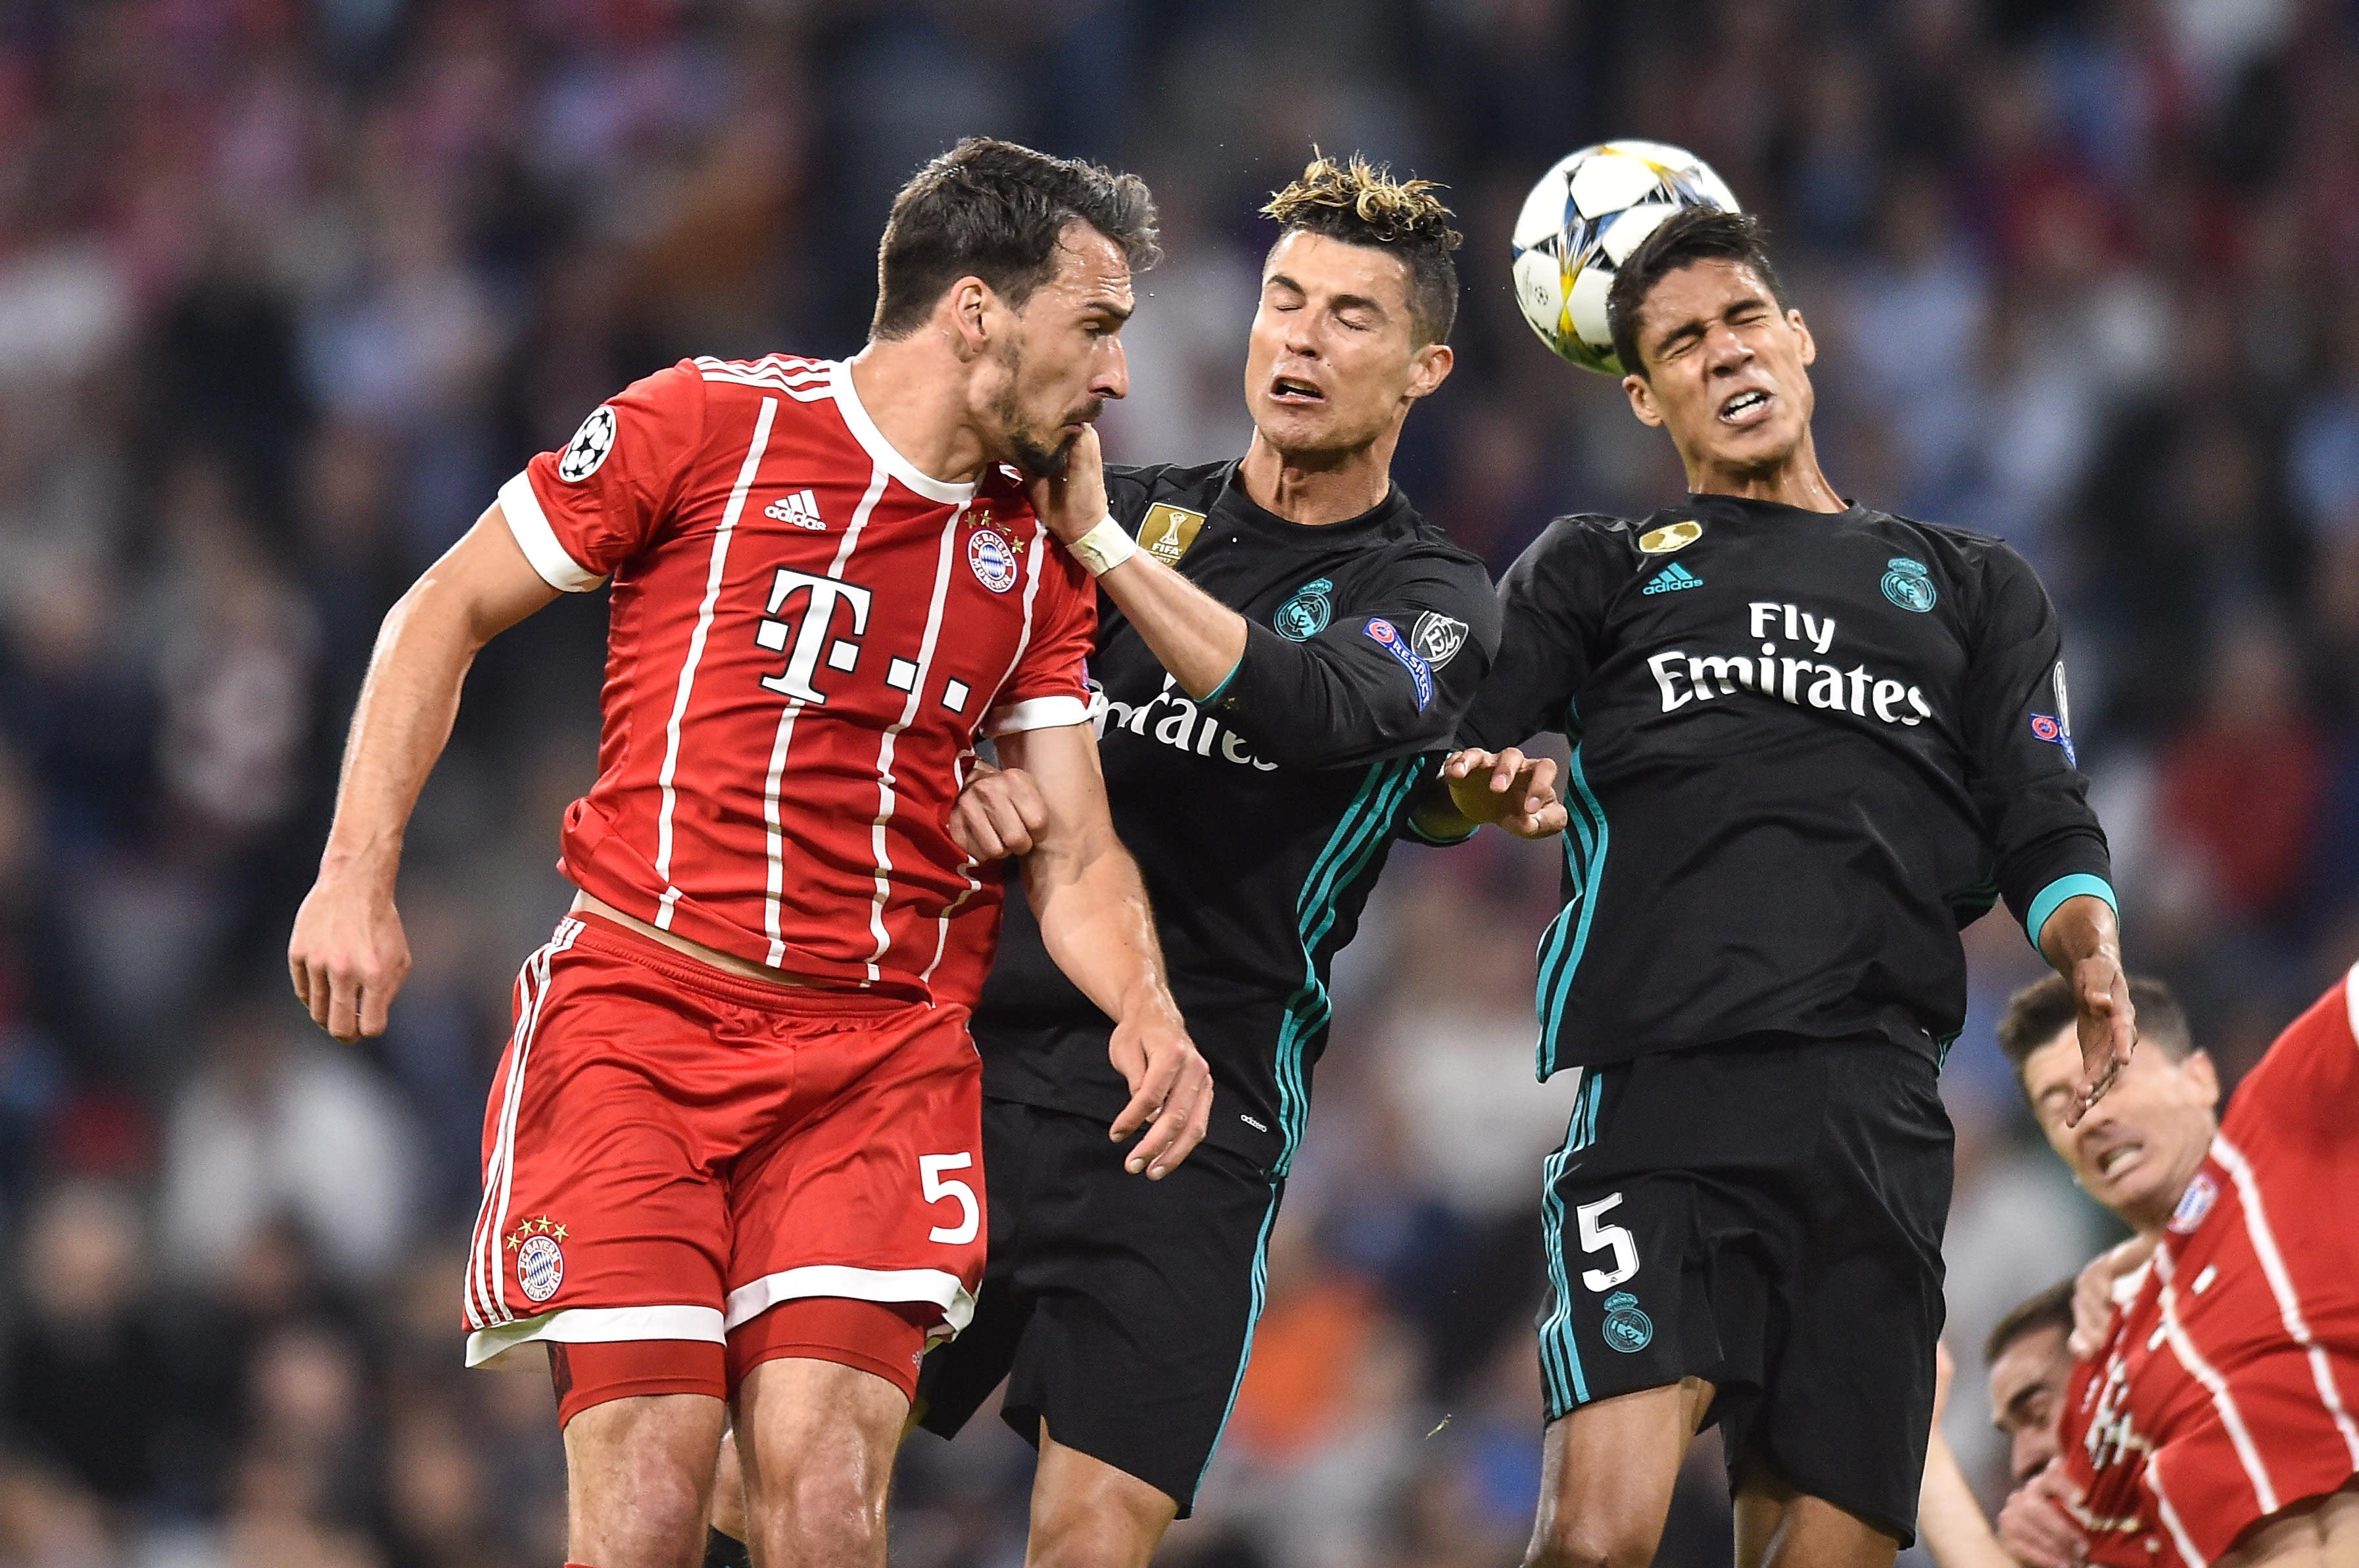 Wie Hoch Muss Bayern Gewinnen